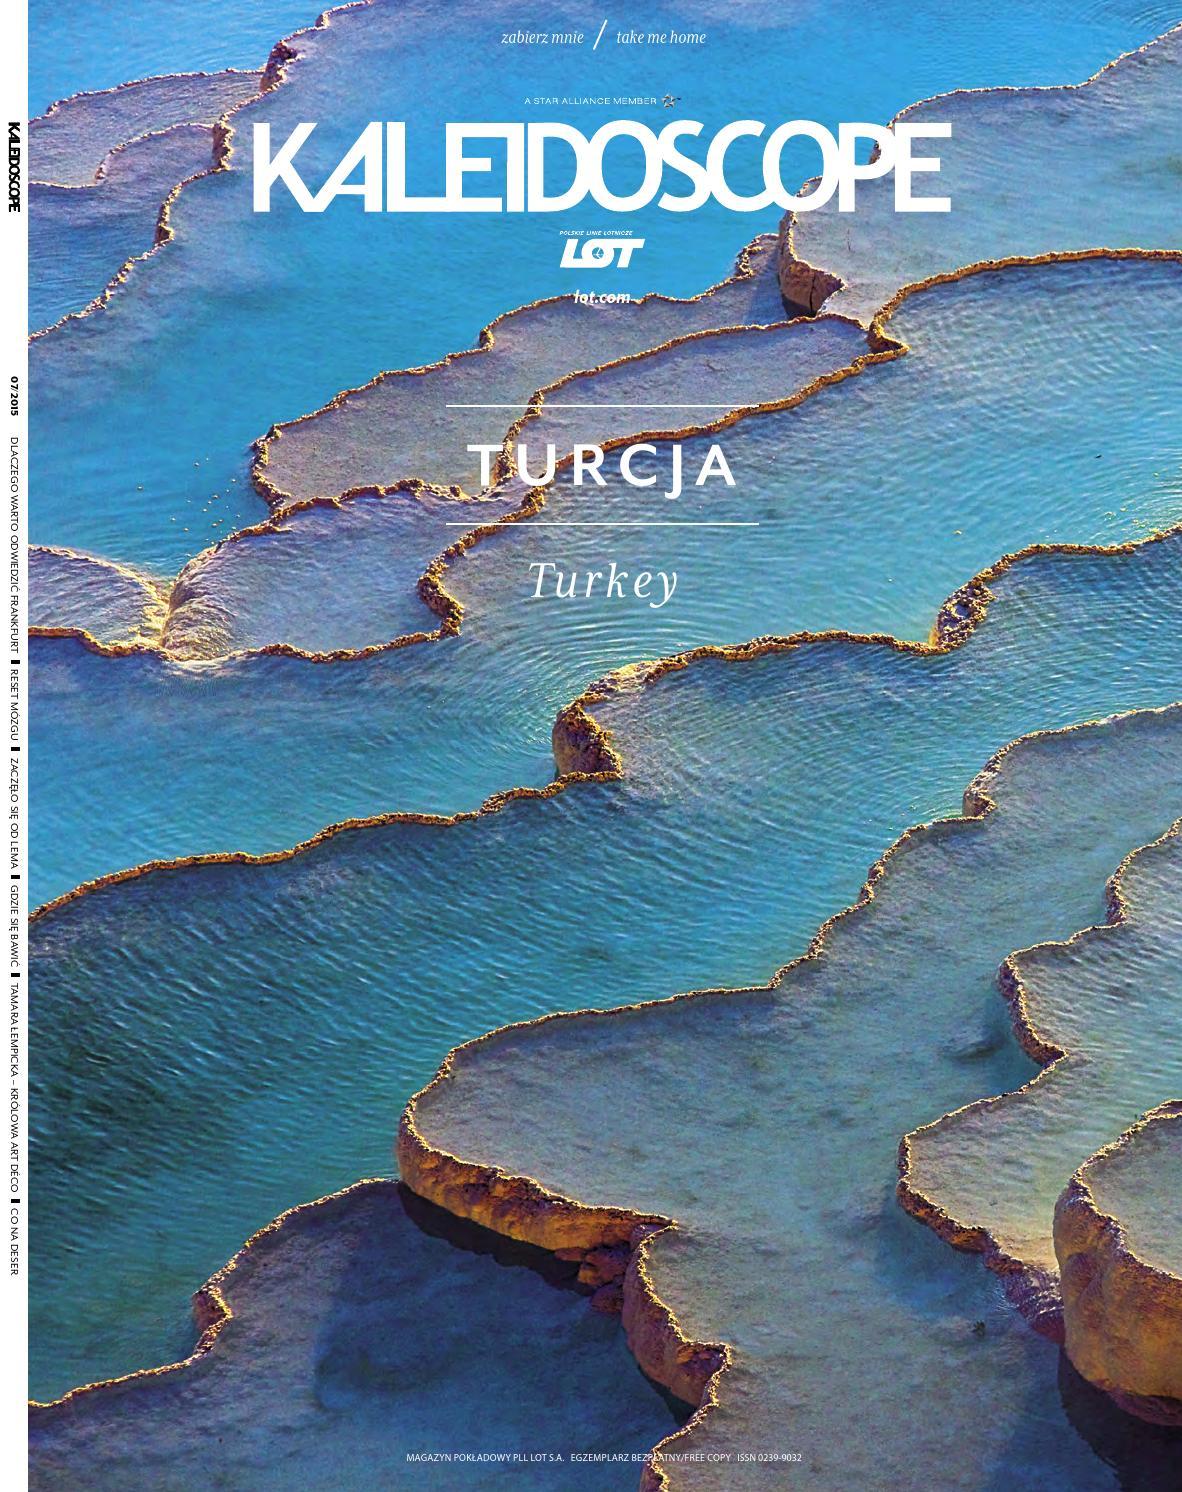 368720c99c9da Kaleidoscope July 2015 by LOT Polish Airlines - issuu